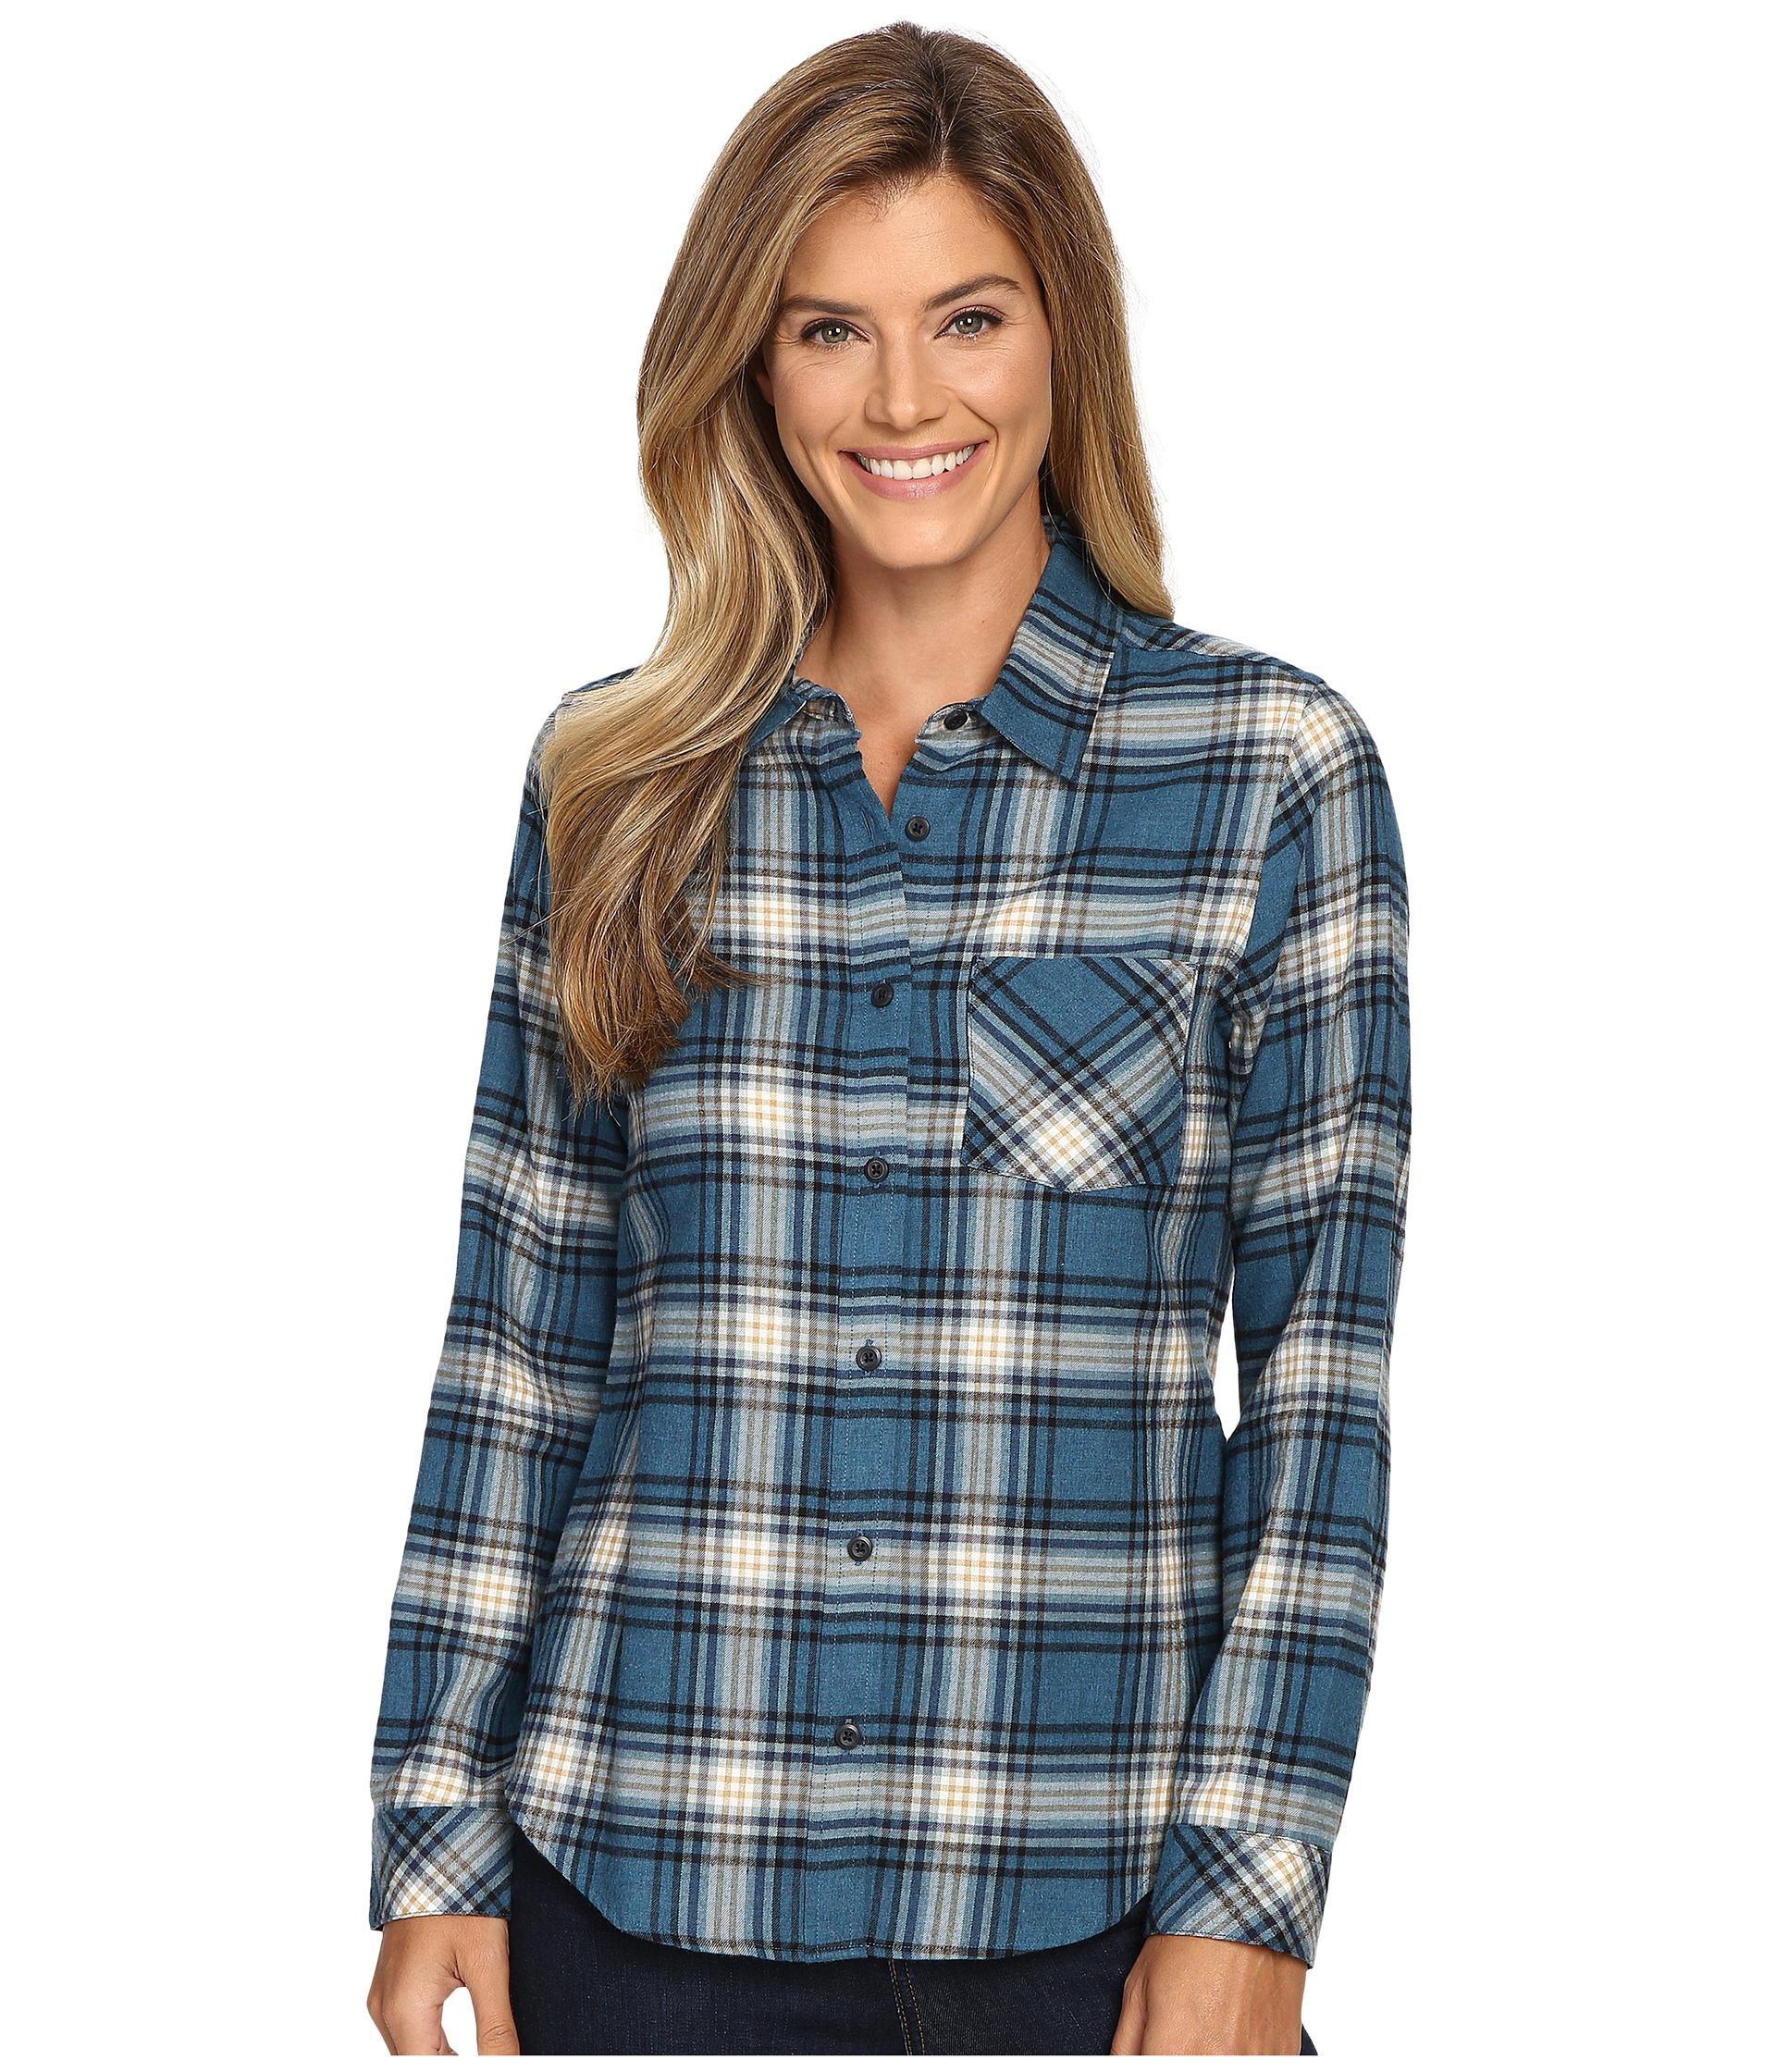 Pendleton frankie flannel shirt night sky heather plaid for Athletic cut flannel shirts